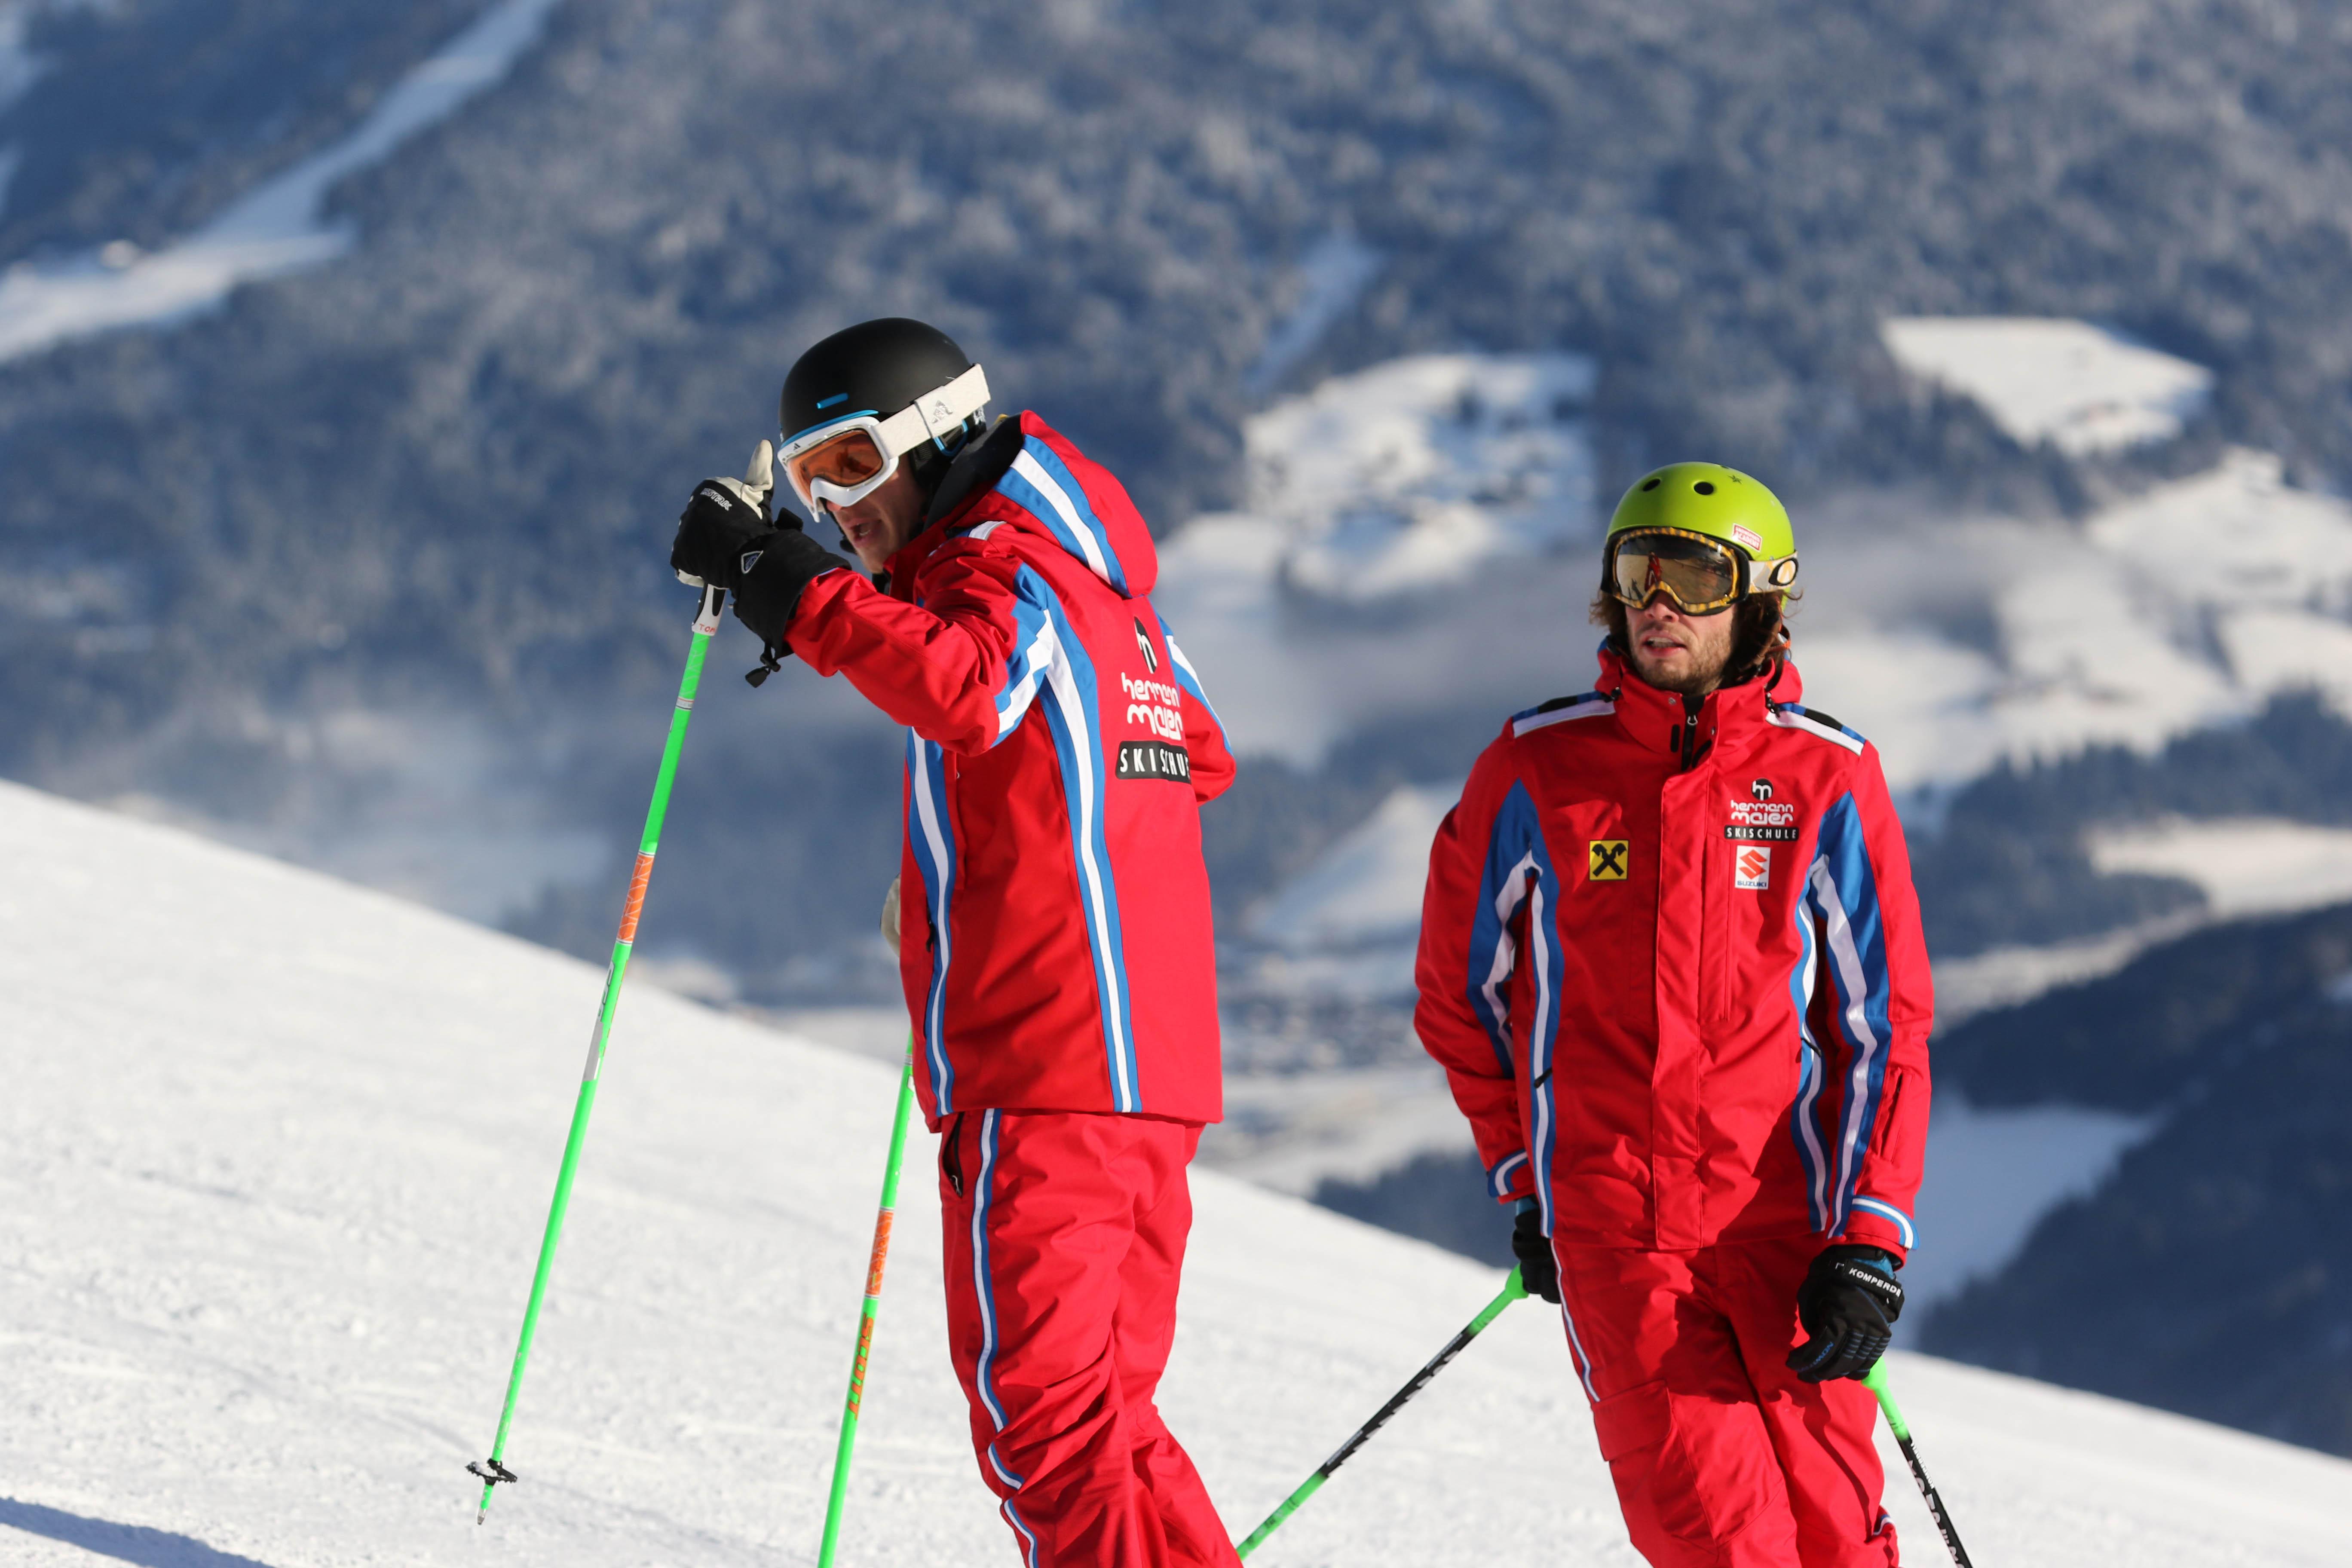 Skischule Flachau